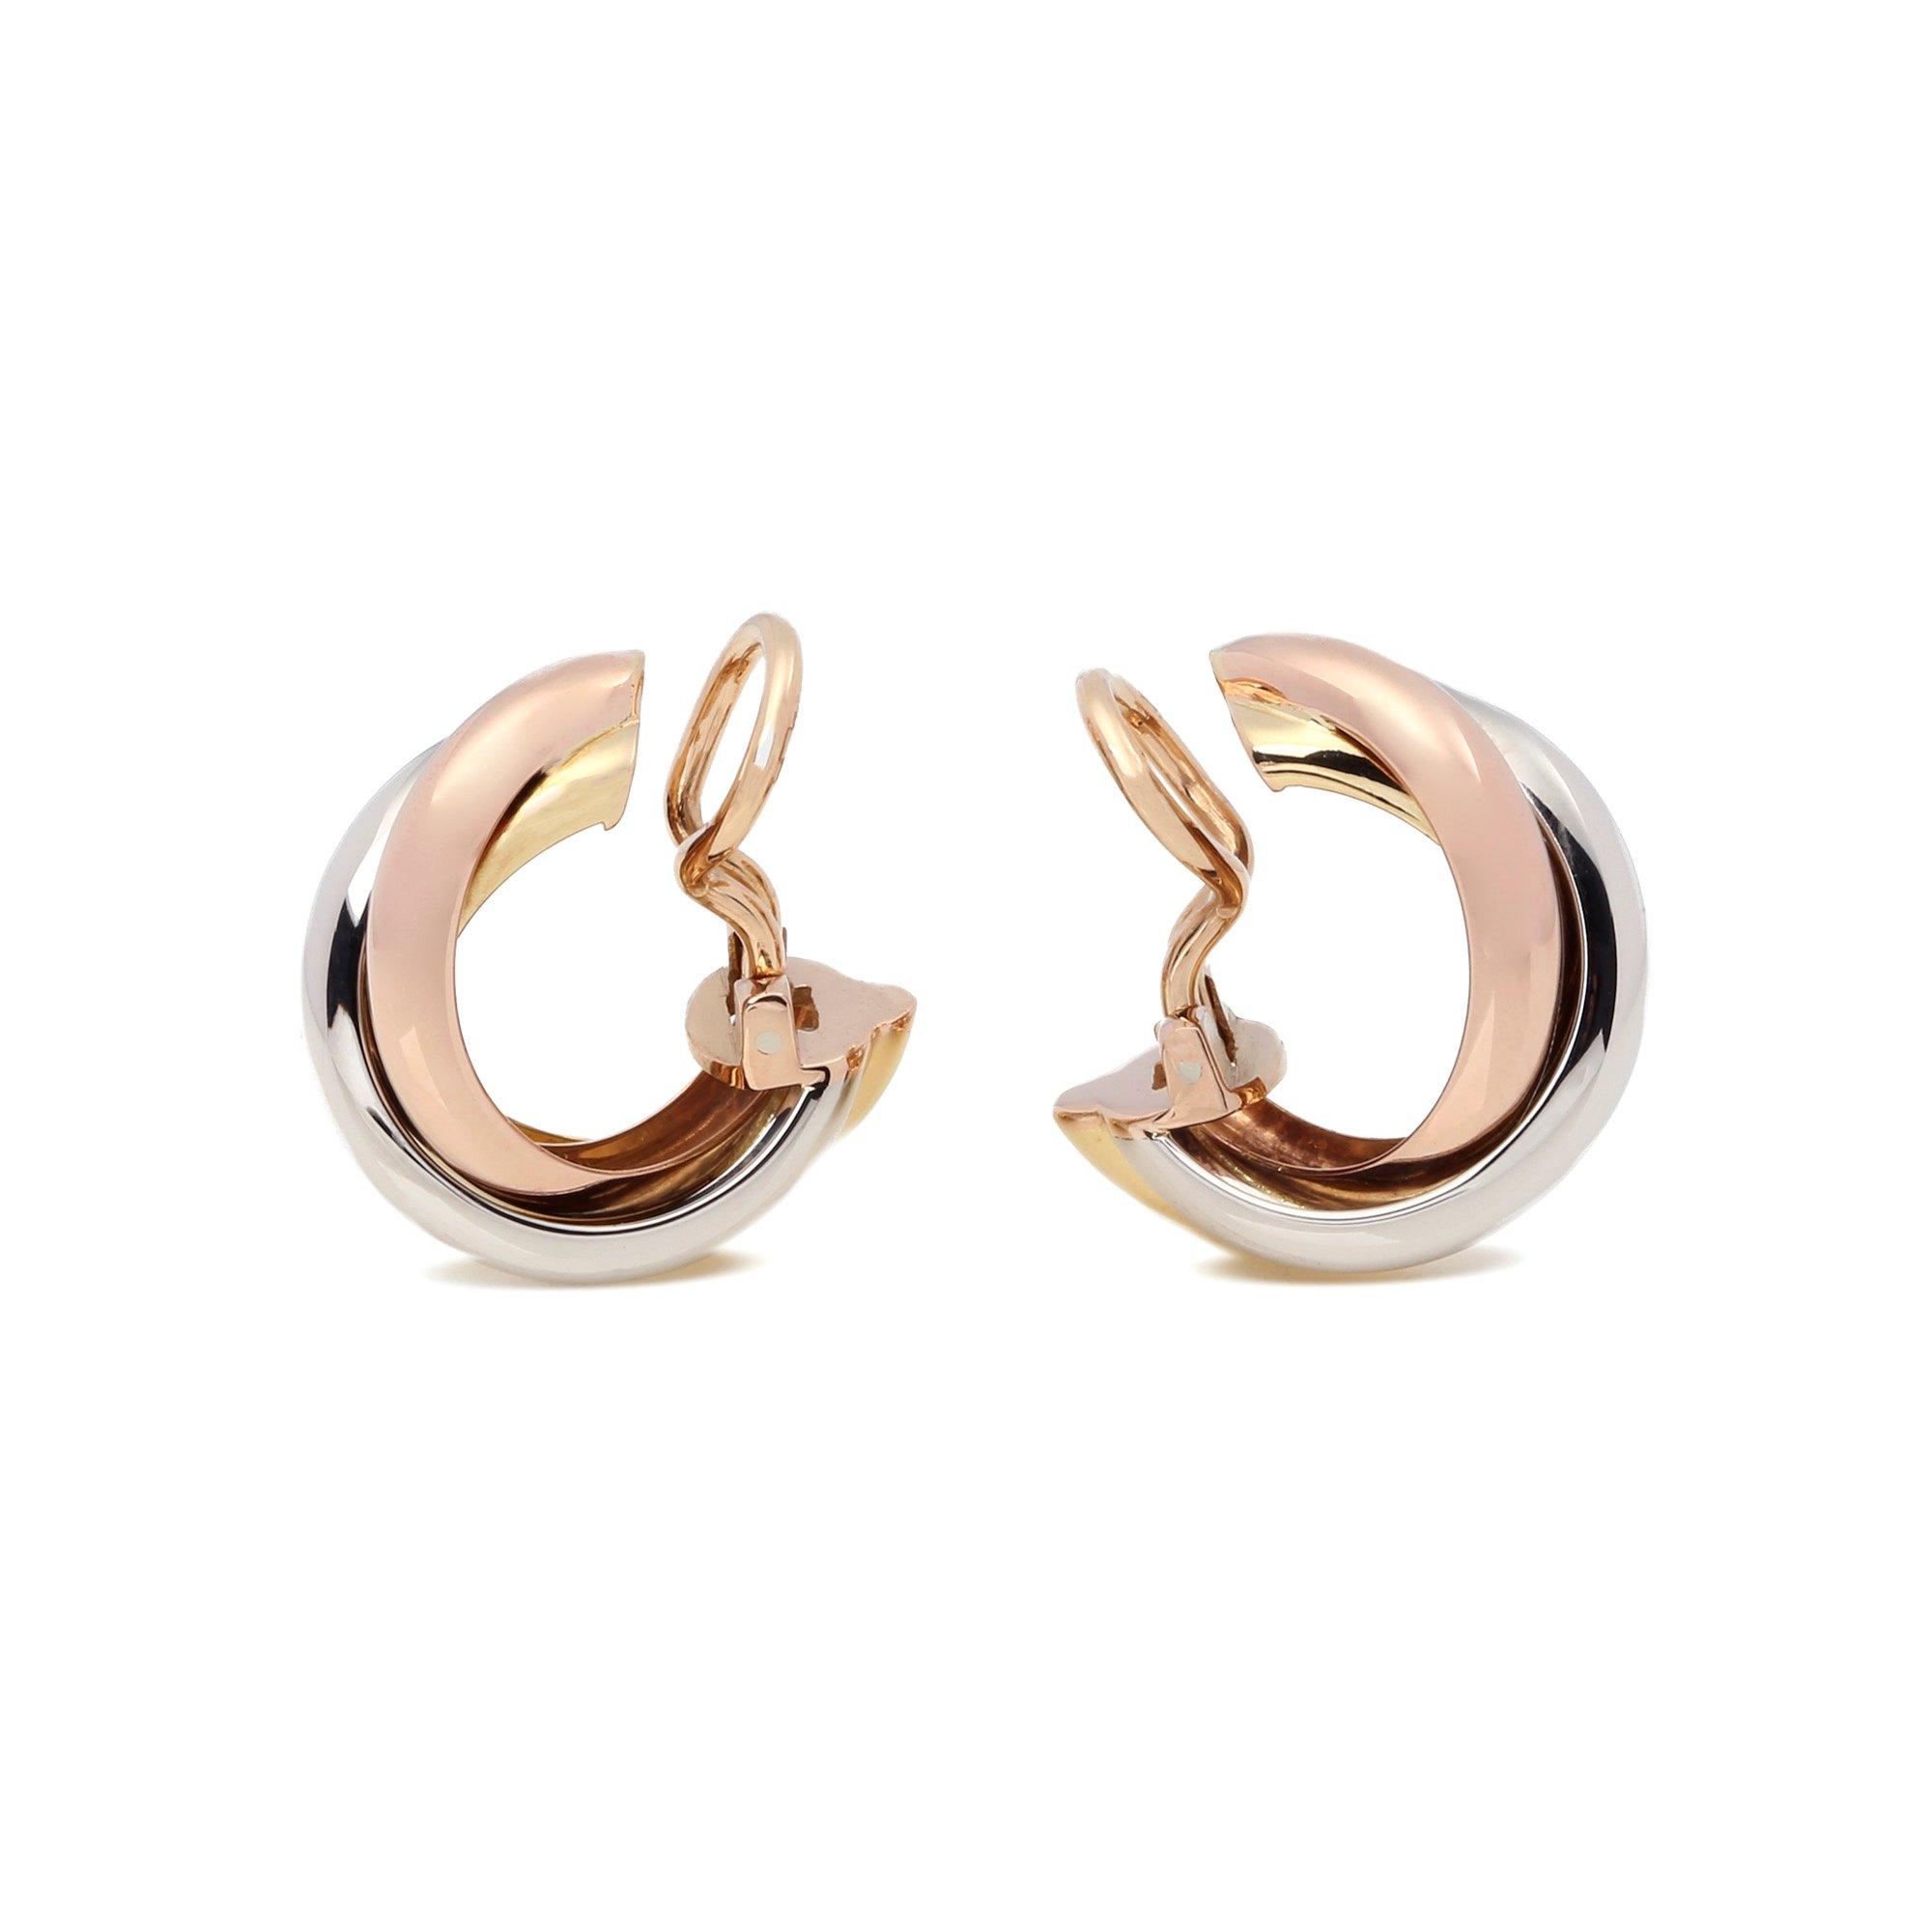 Cartier Clip Hoop Earrings